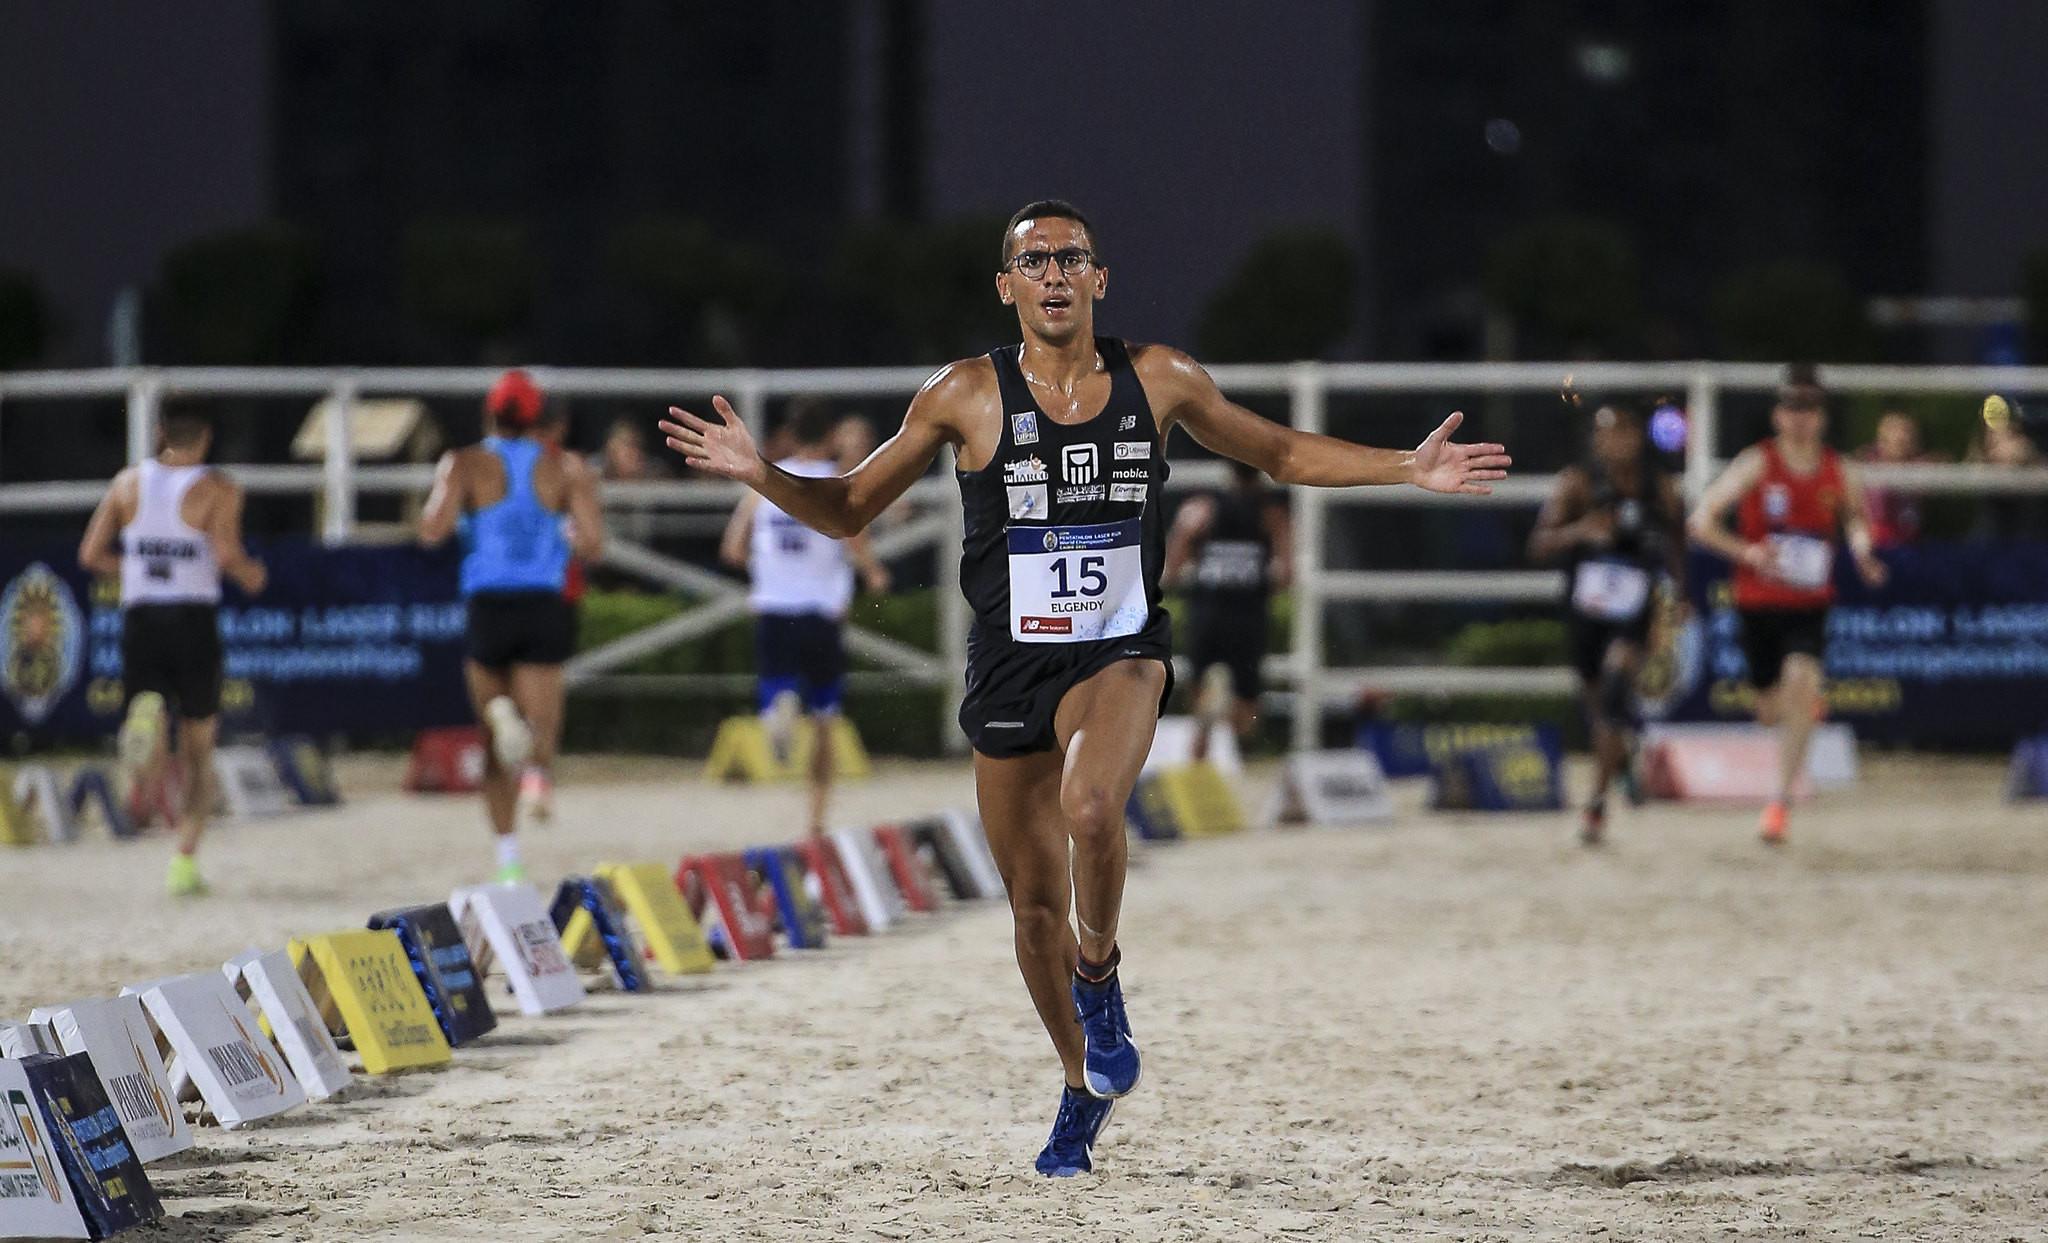 Egypt's Elgendy tops men's qualifying at UIPM Junior World Championships in Alexandria